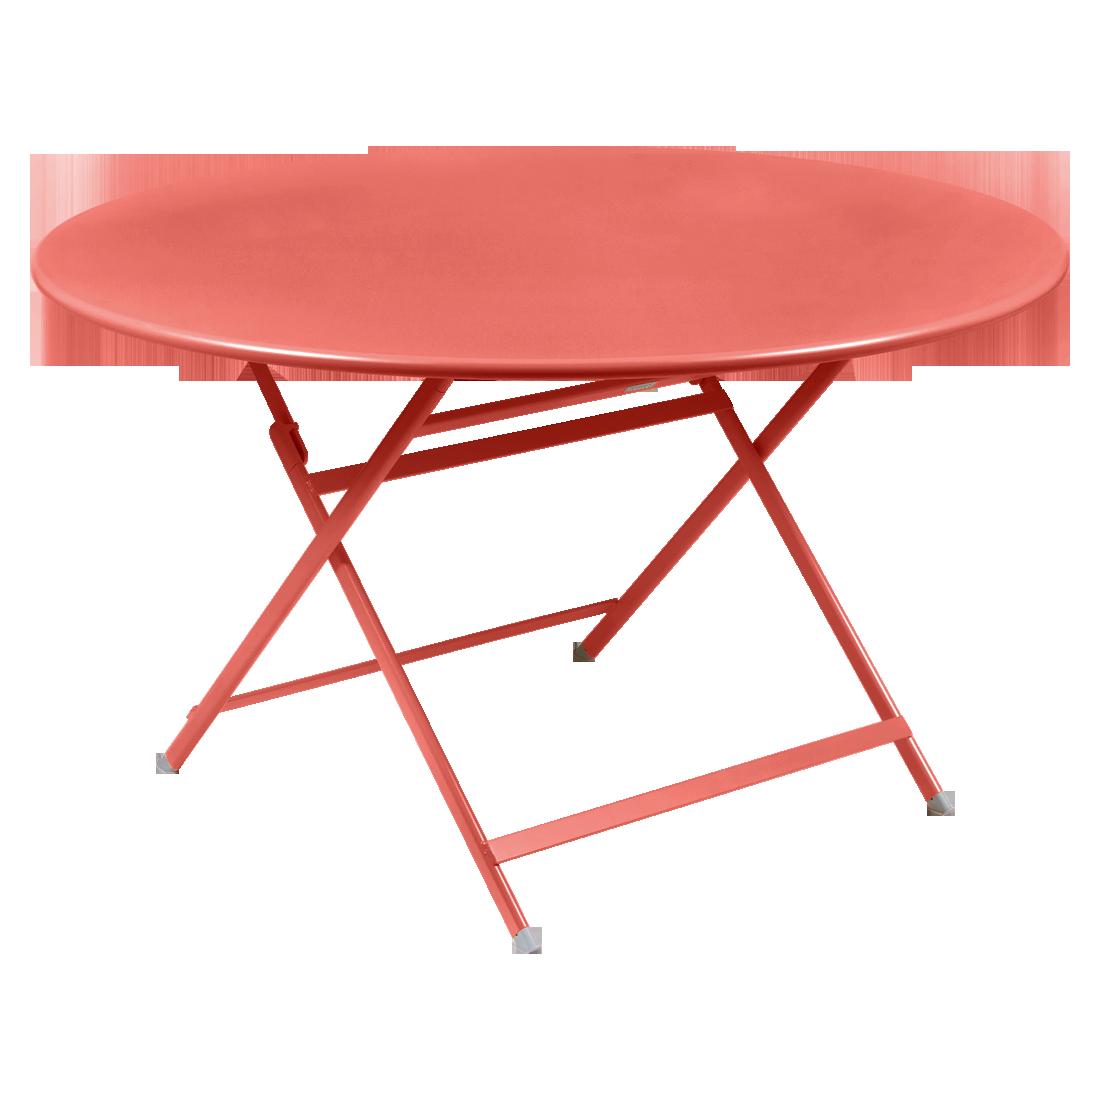 table de jardin pliante, table metal ronde, table metal 7 personnes, table de jardin rose, table metal rose